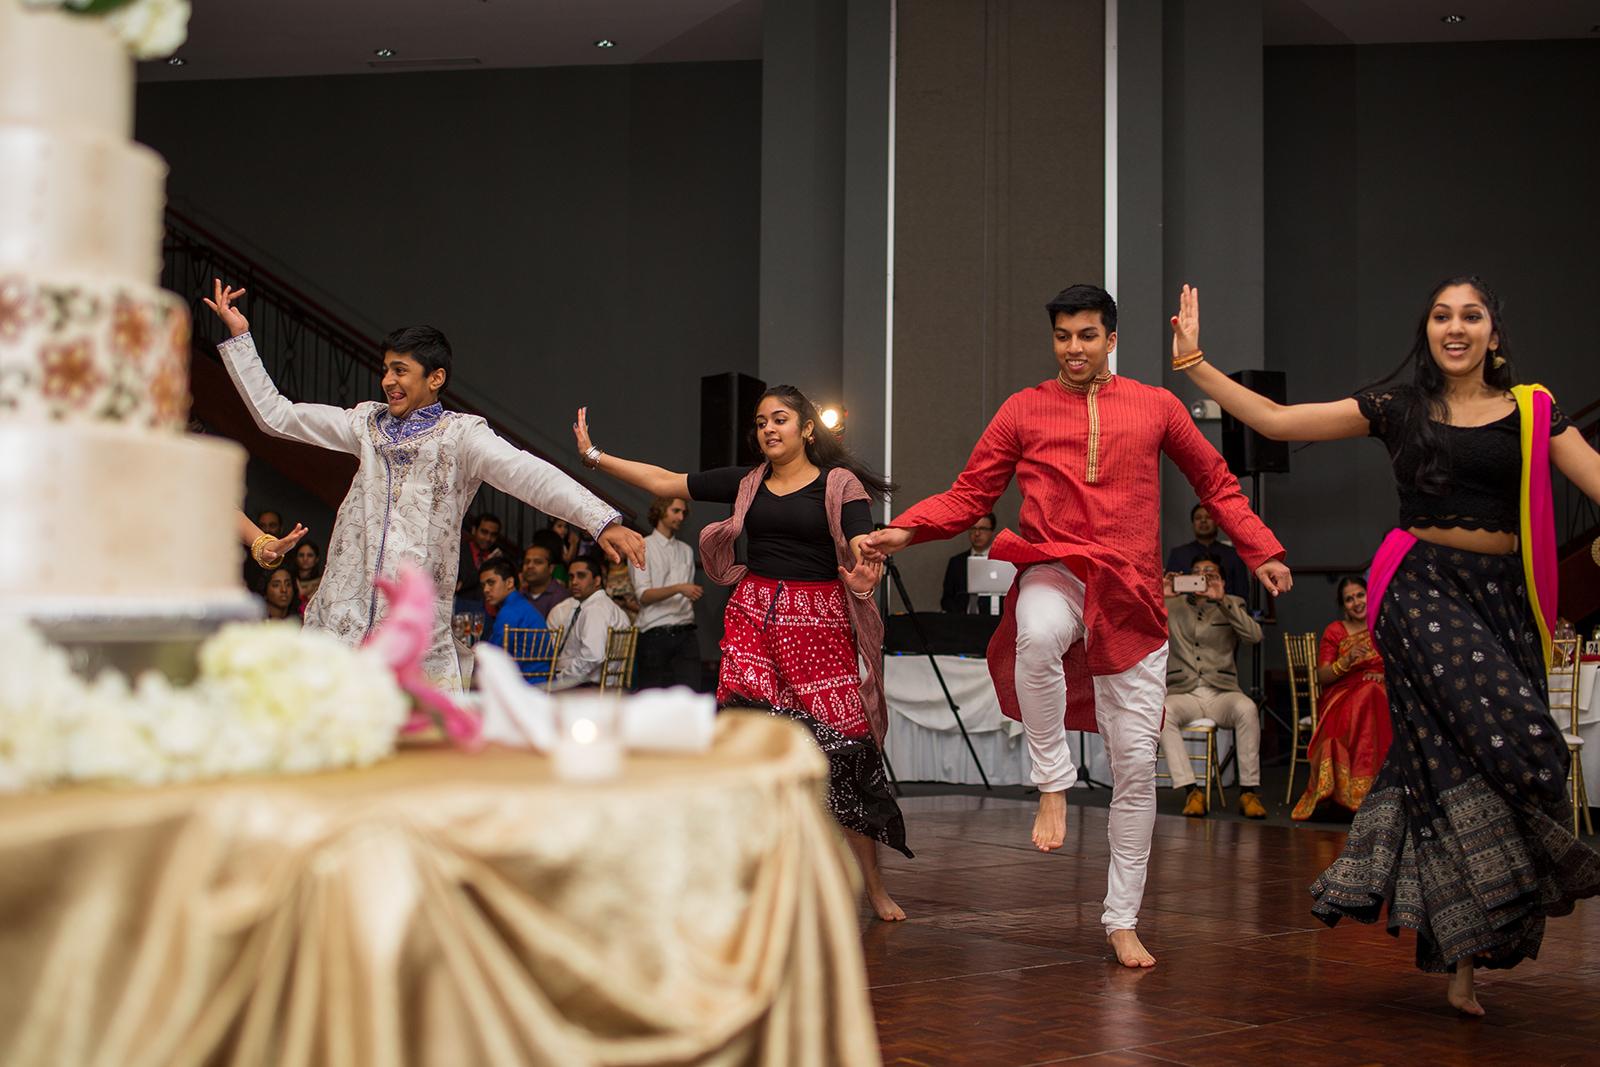 Le Cape Weddings - South Asian Wedding - Ishani and Sidhart - Wedding Reception-104.jpg